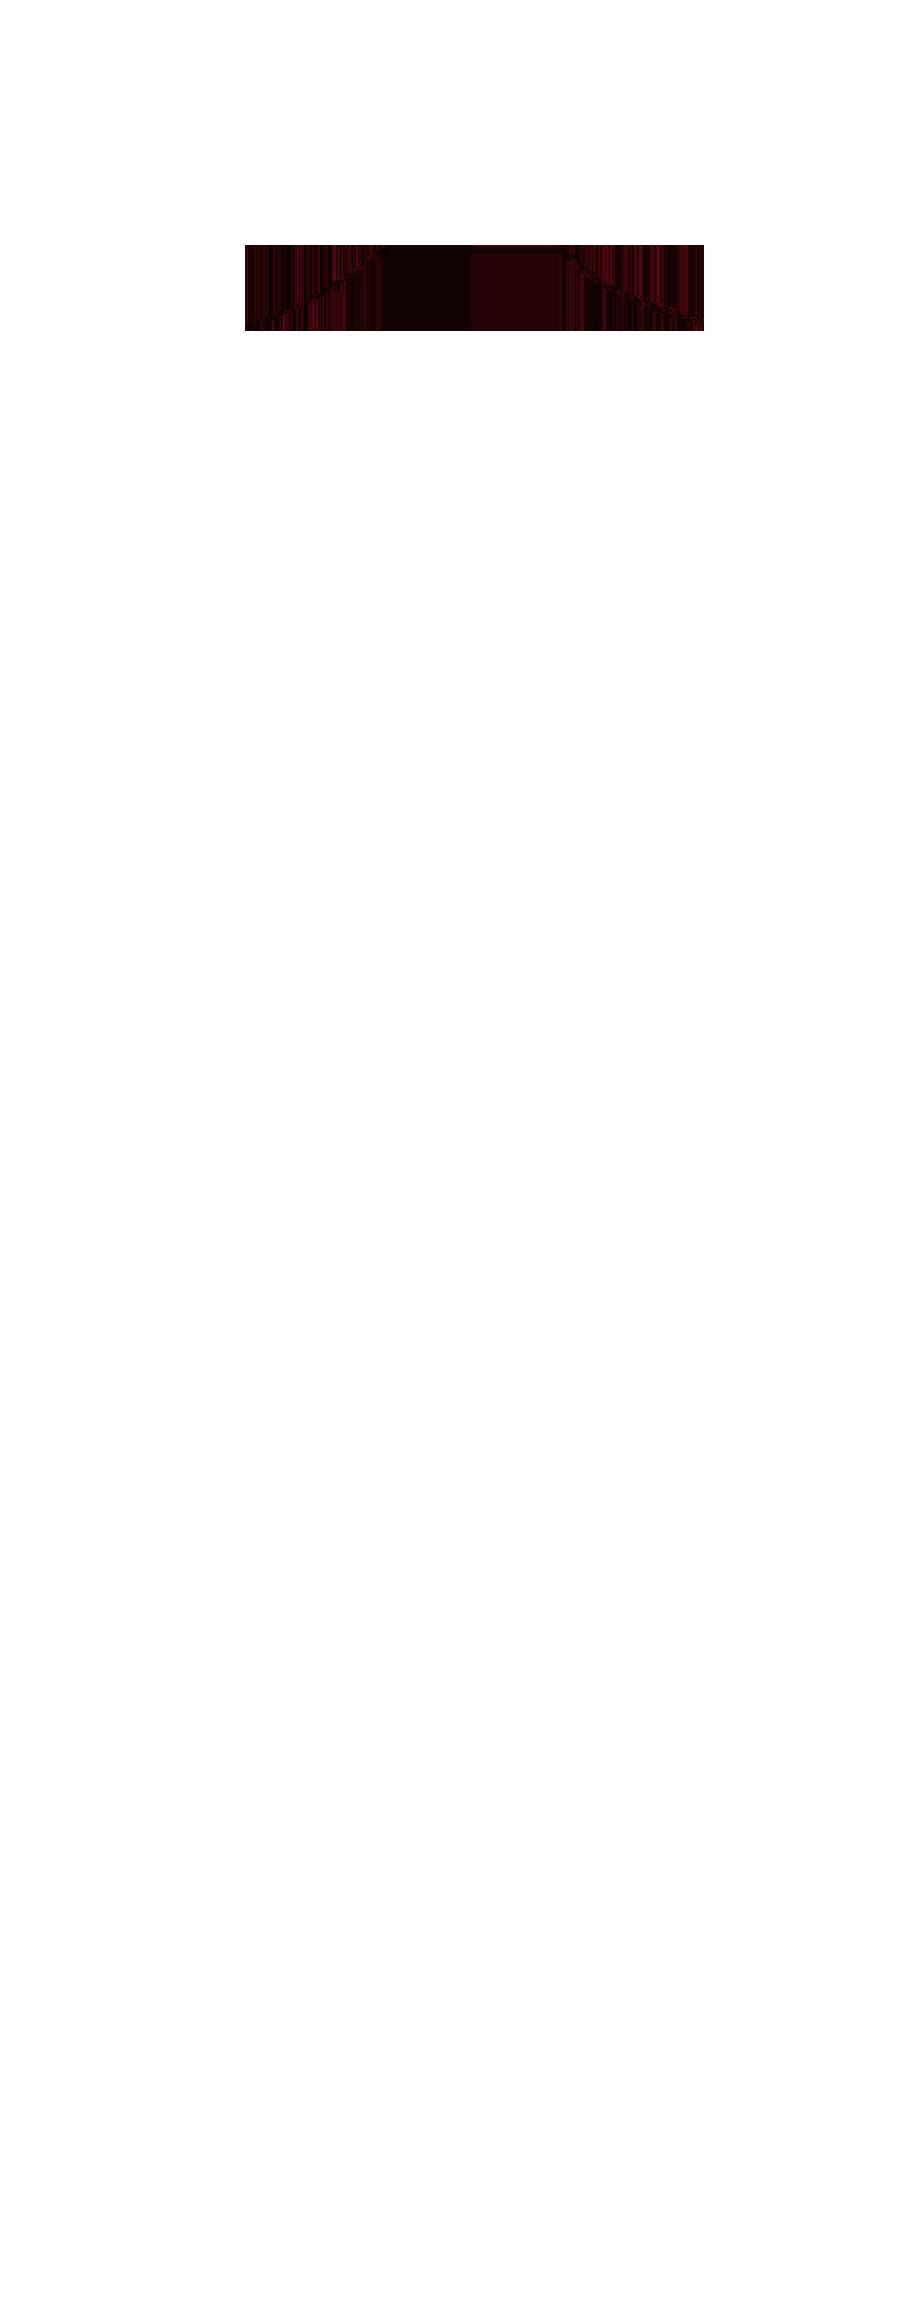 NEFL-9